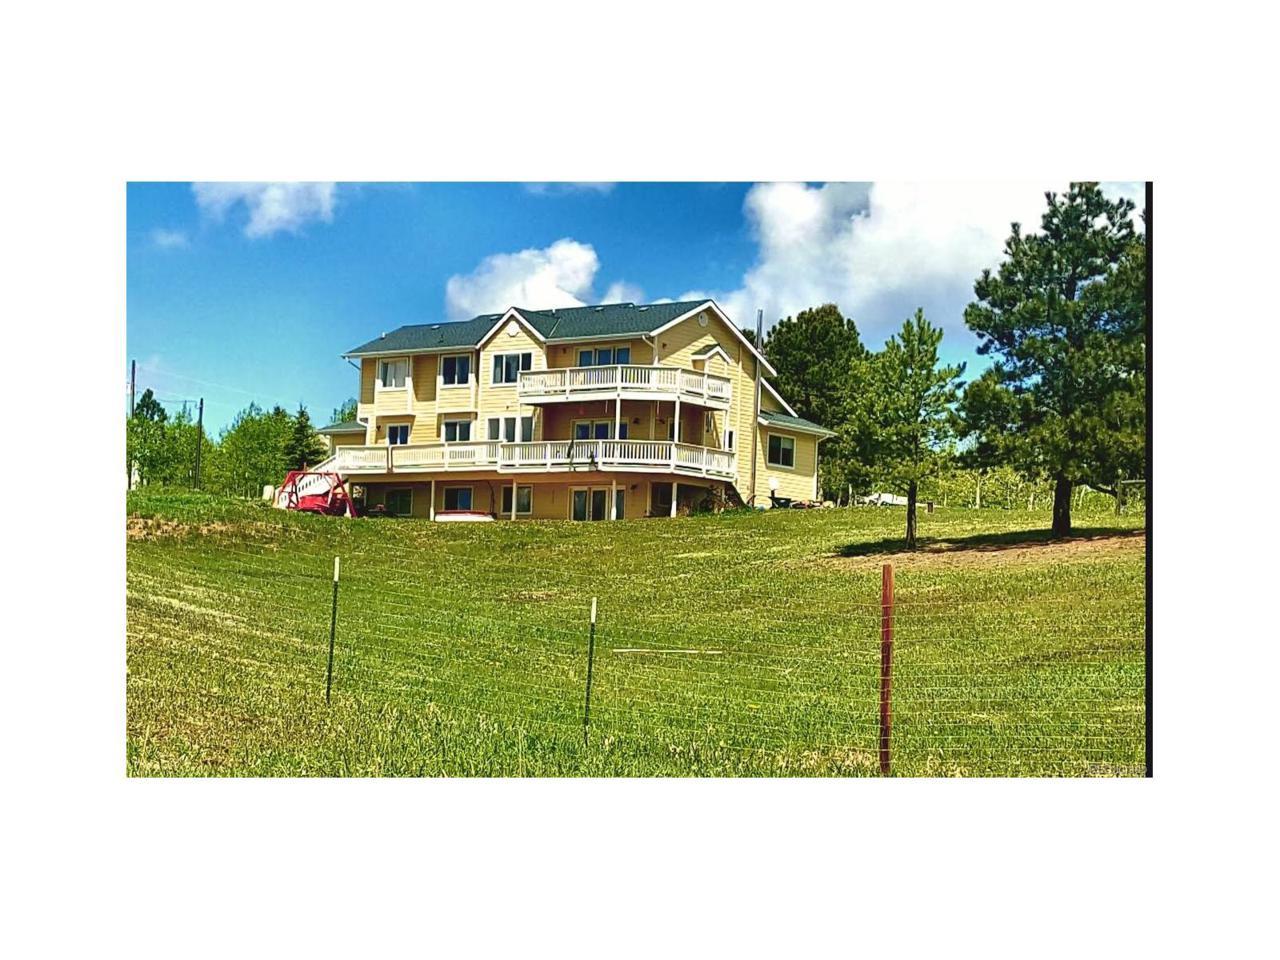 78 Moss Rock Court, Divide, CO 80814 (MLS #5861390) :: 8z Real Estate